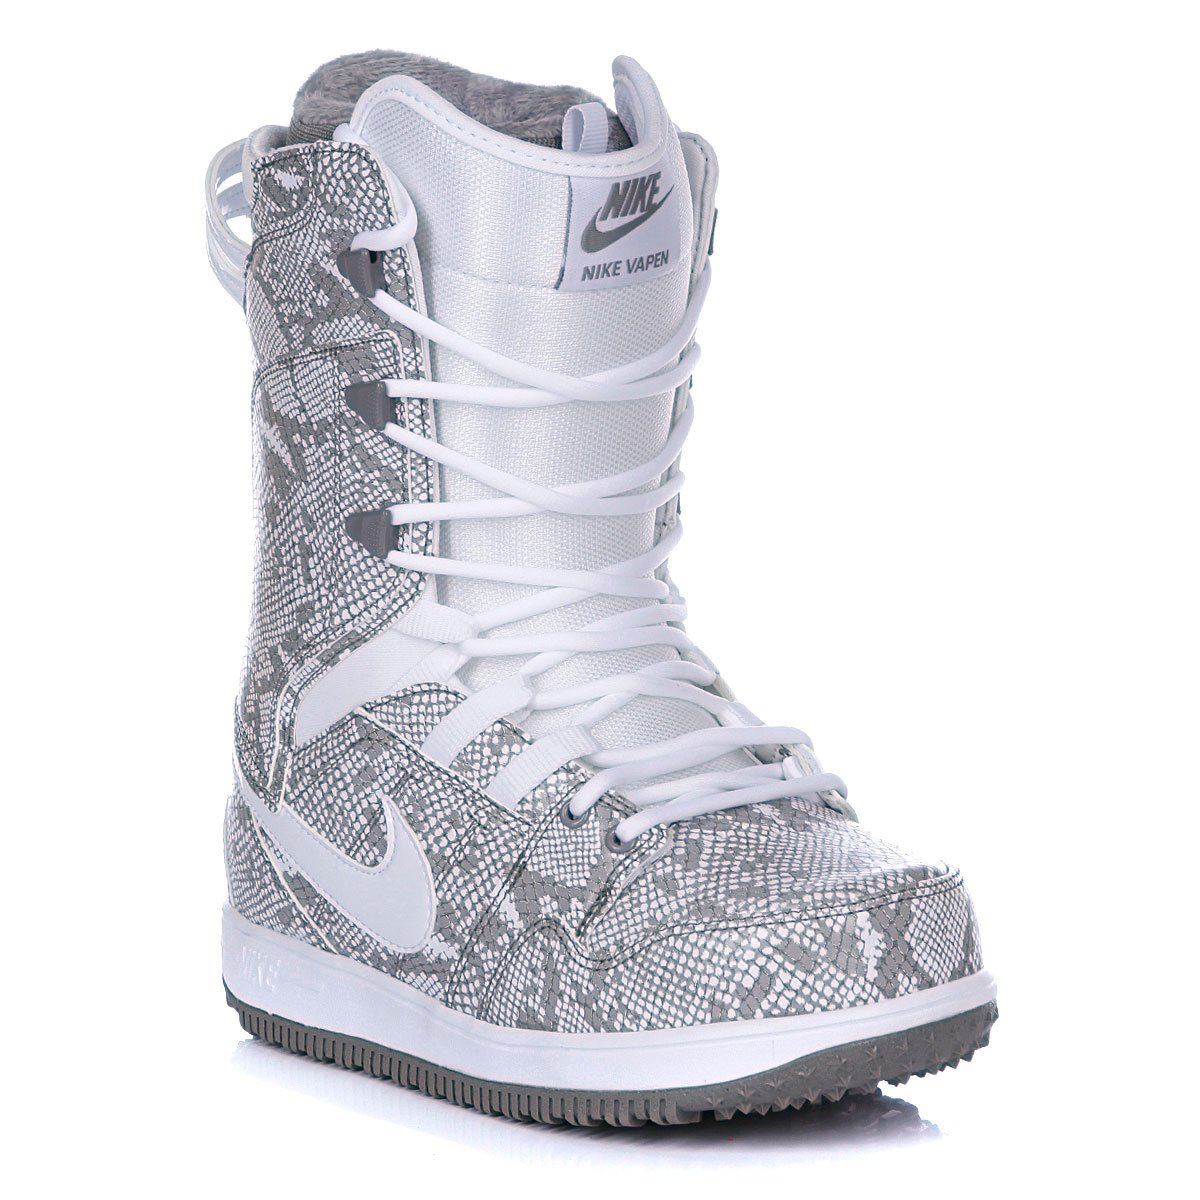 40e963c3 Купить ботинки для сноуборда женские Nike Vapen White/White (447124 ...